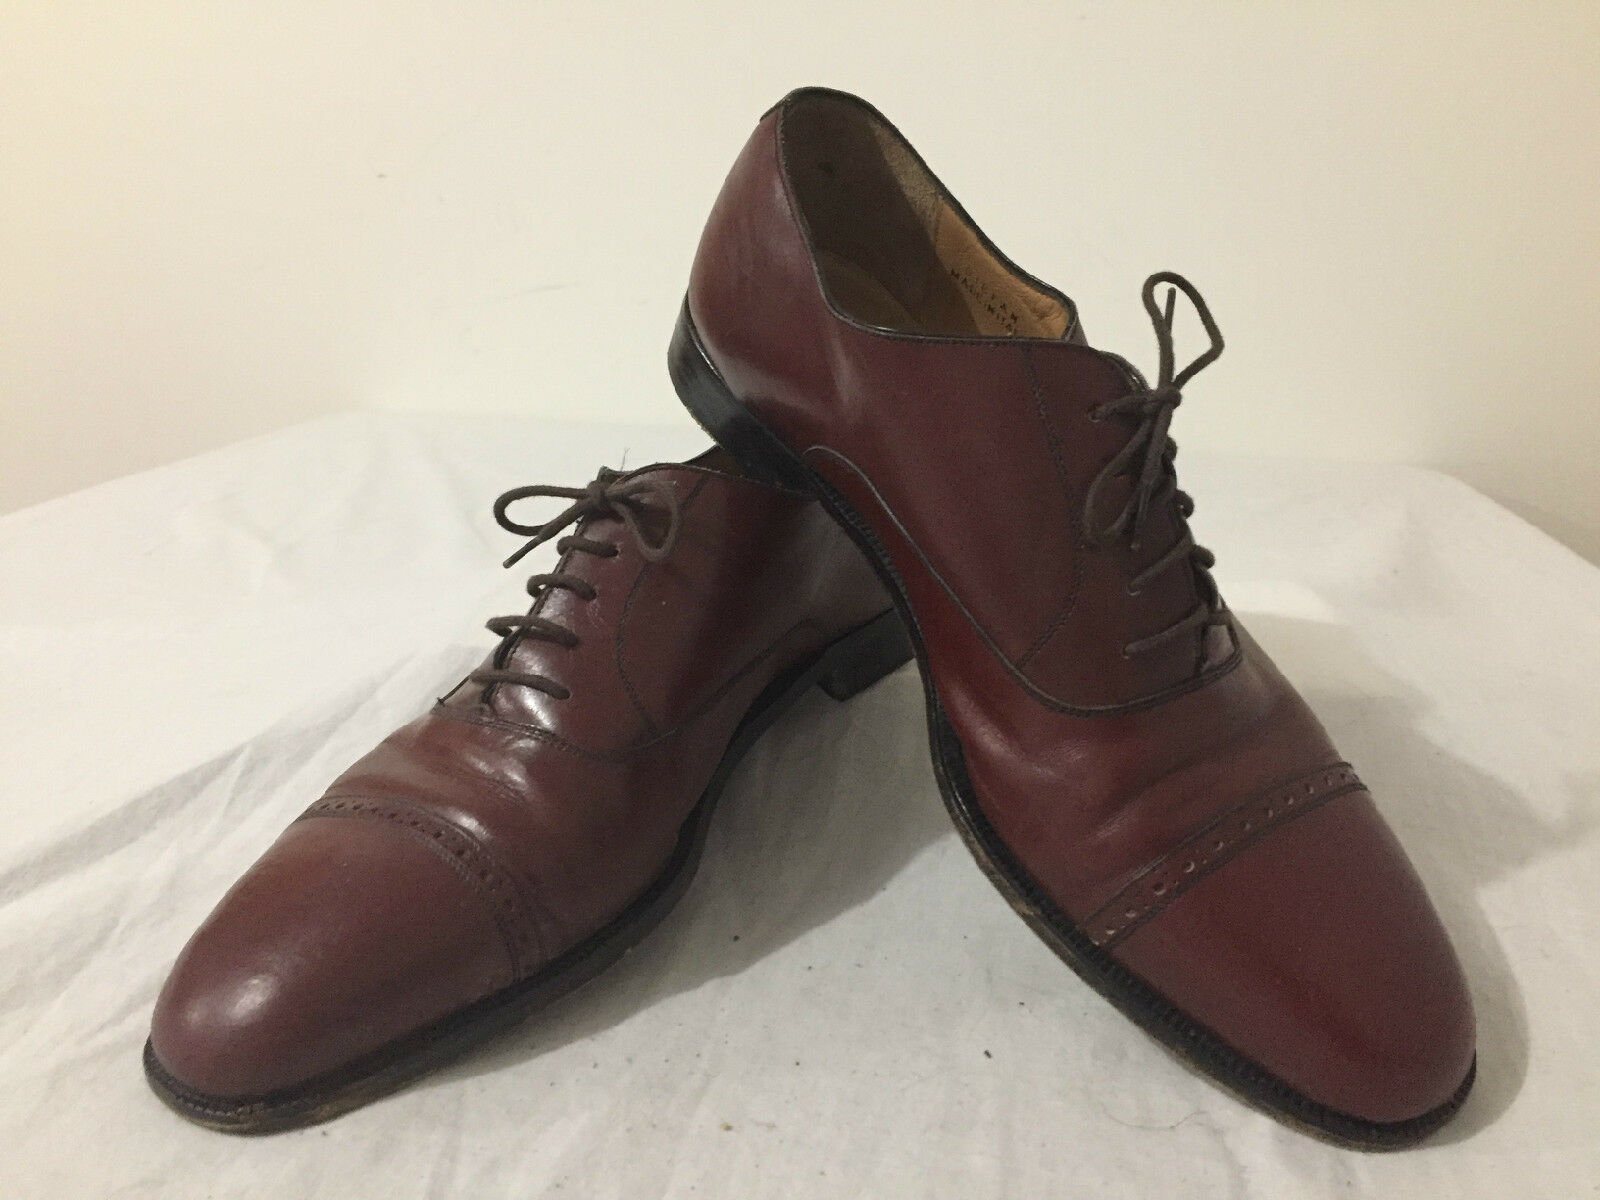 BALLY 'Stefan' Cap Toe Oxford Quarter Brogues shoes Brown Leather Size 10.5D